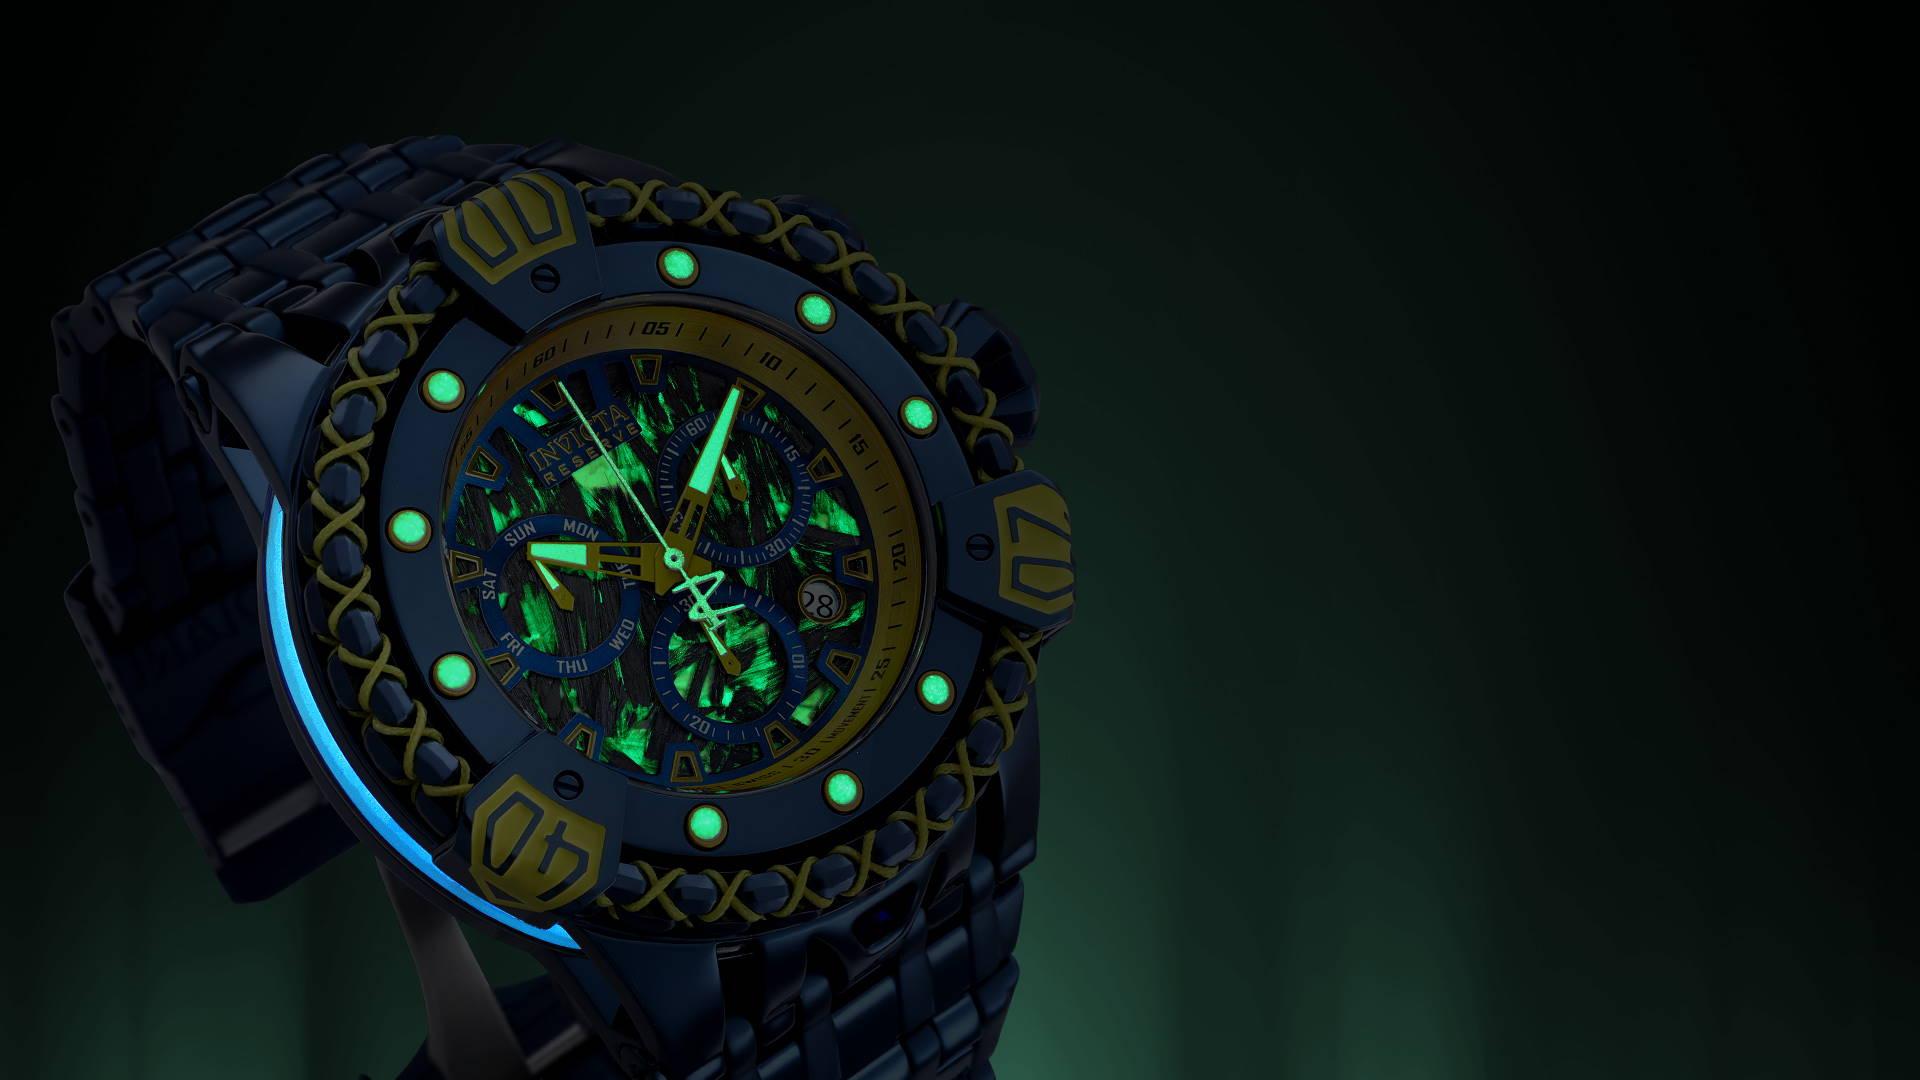 Thermoglow glow image